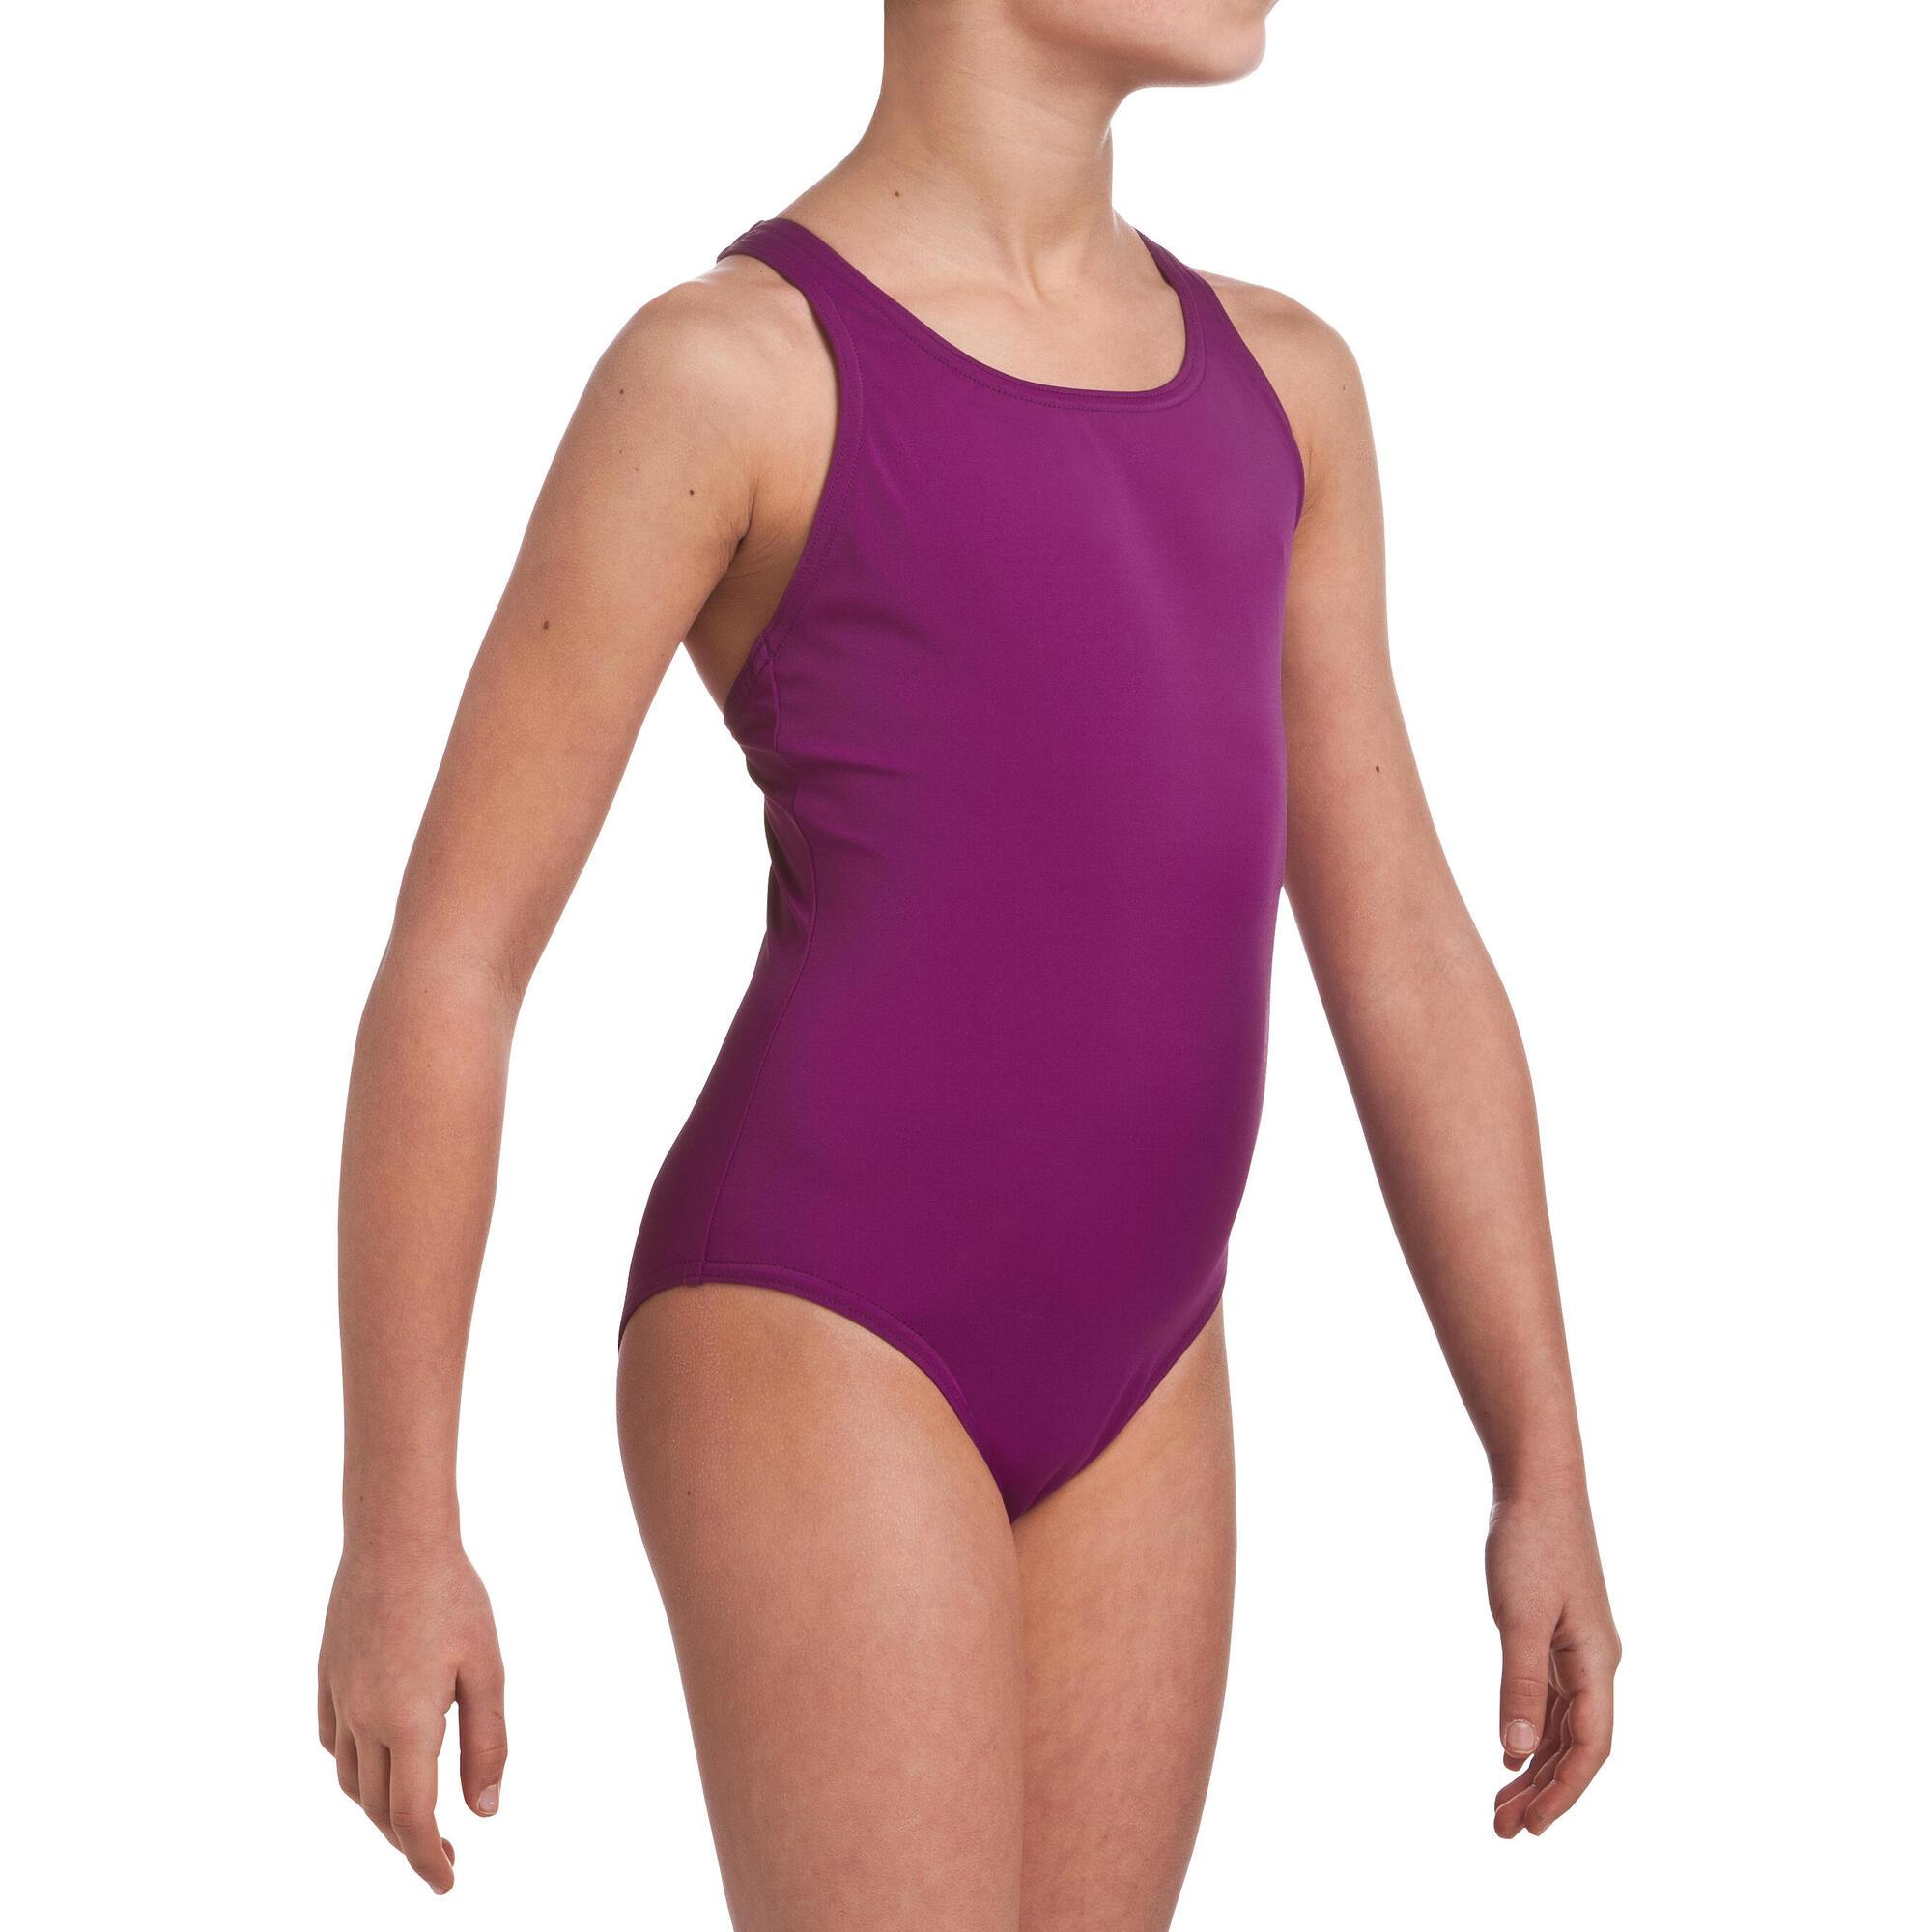 45bd508da96ff Leony Girls  One-Piece Swimsuit - Purple